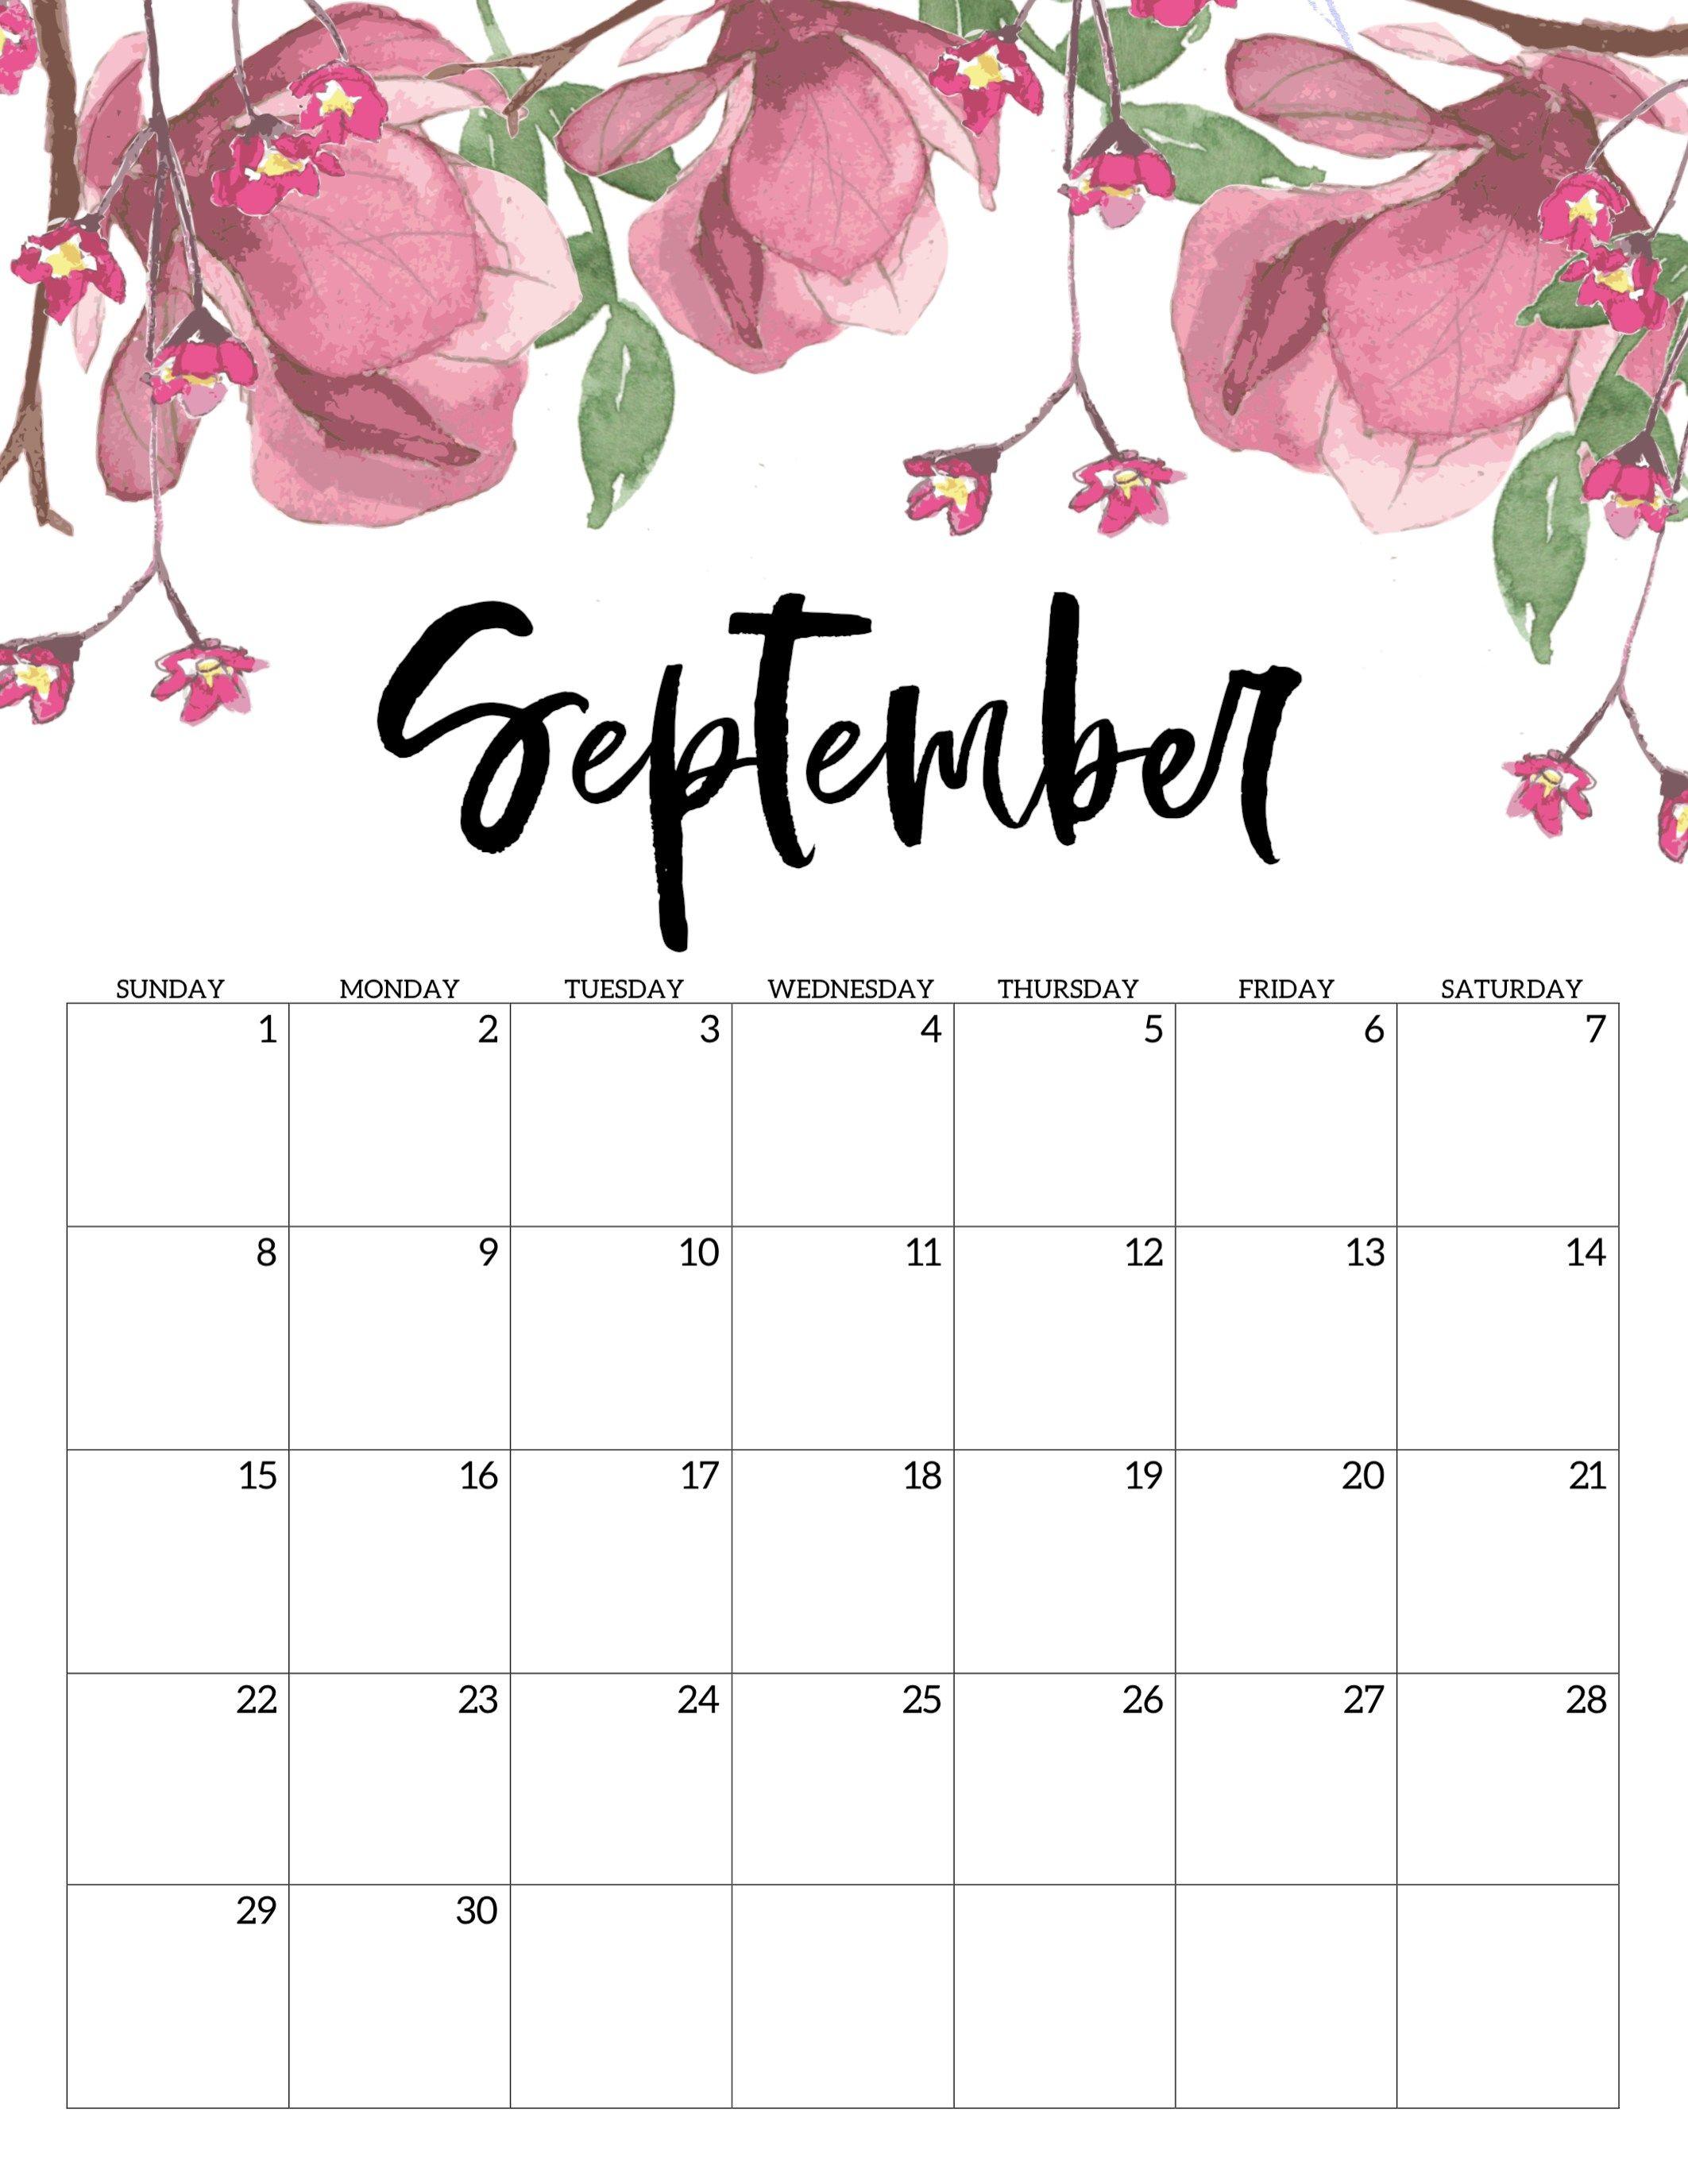 Free Printable Calendar 2019  Floral | Еженедельный with regard to Kalendar Kuda September 2020